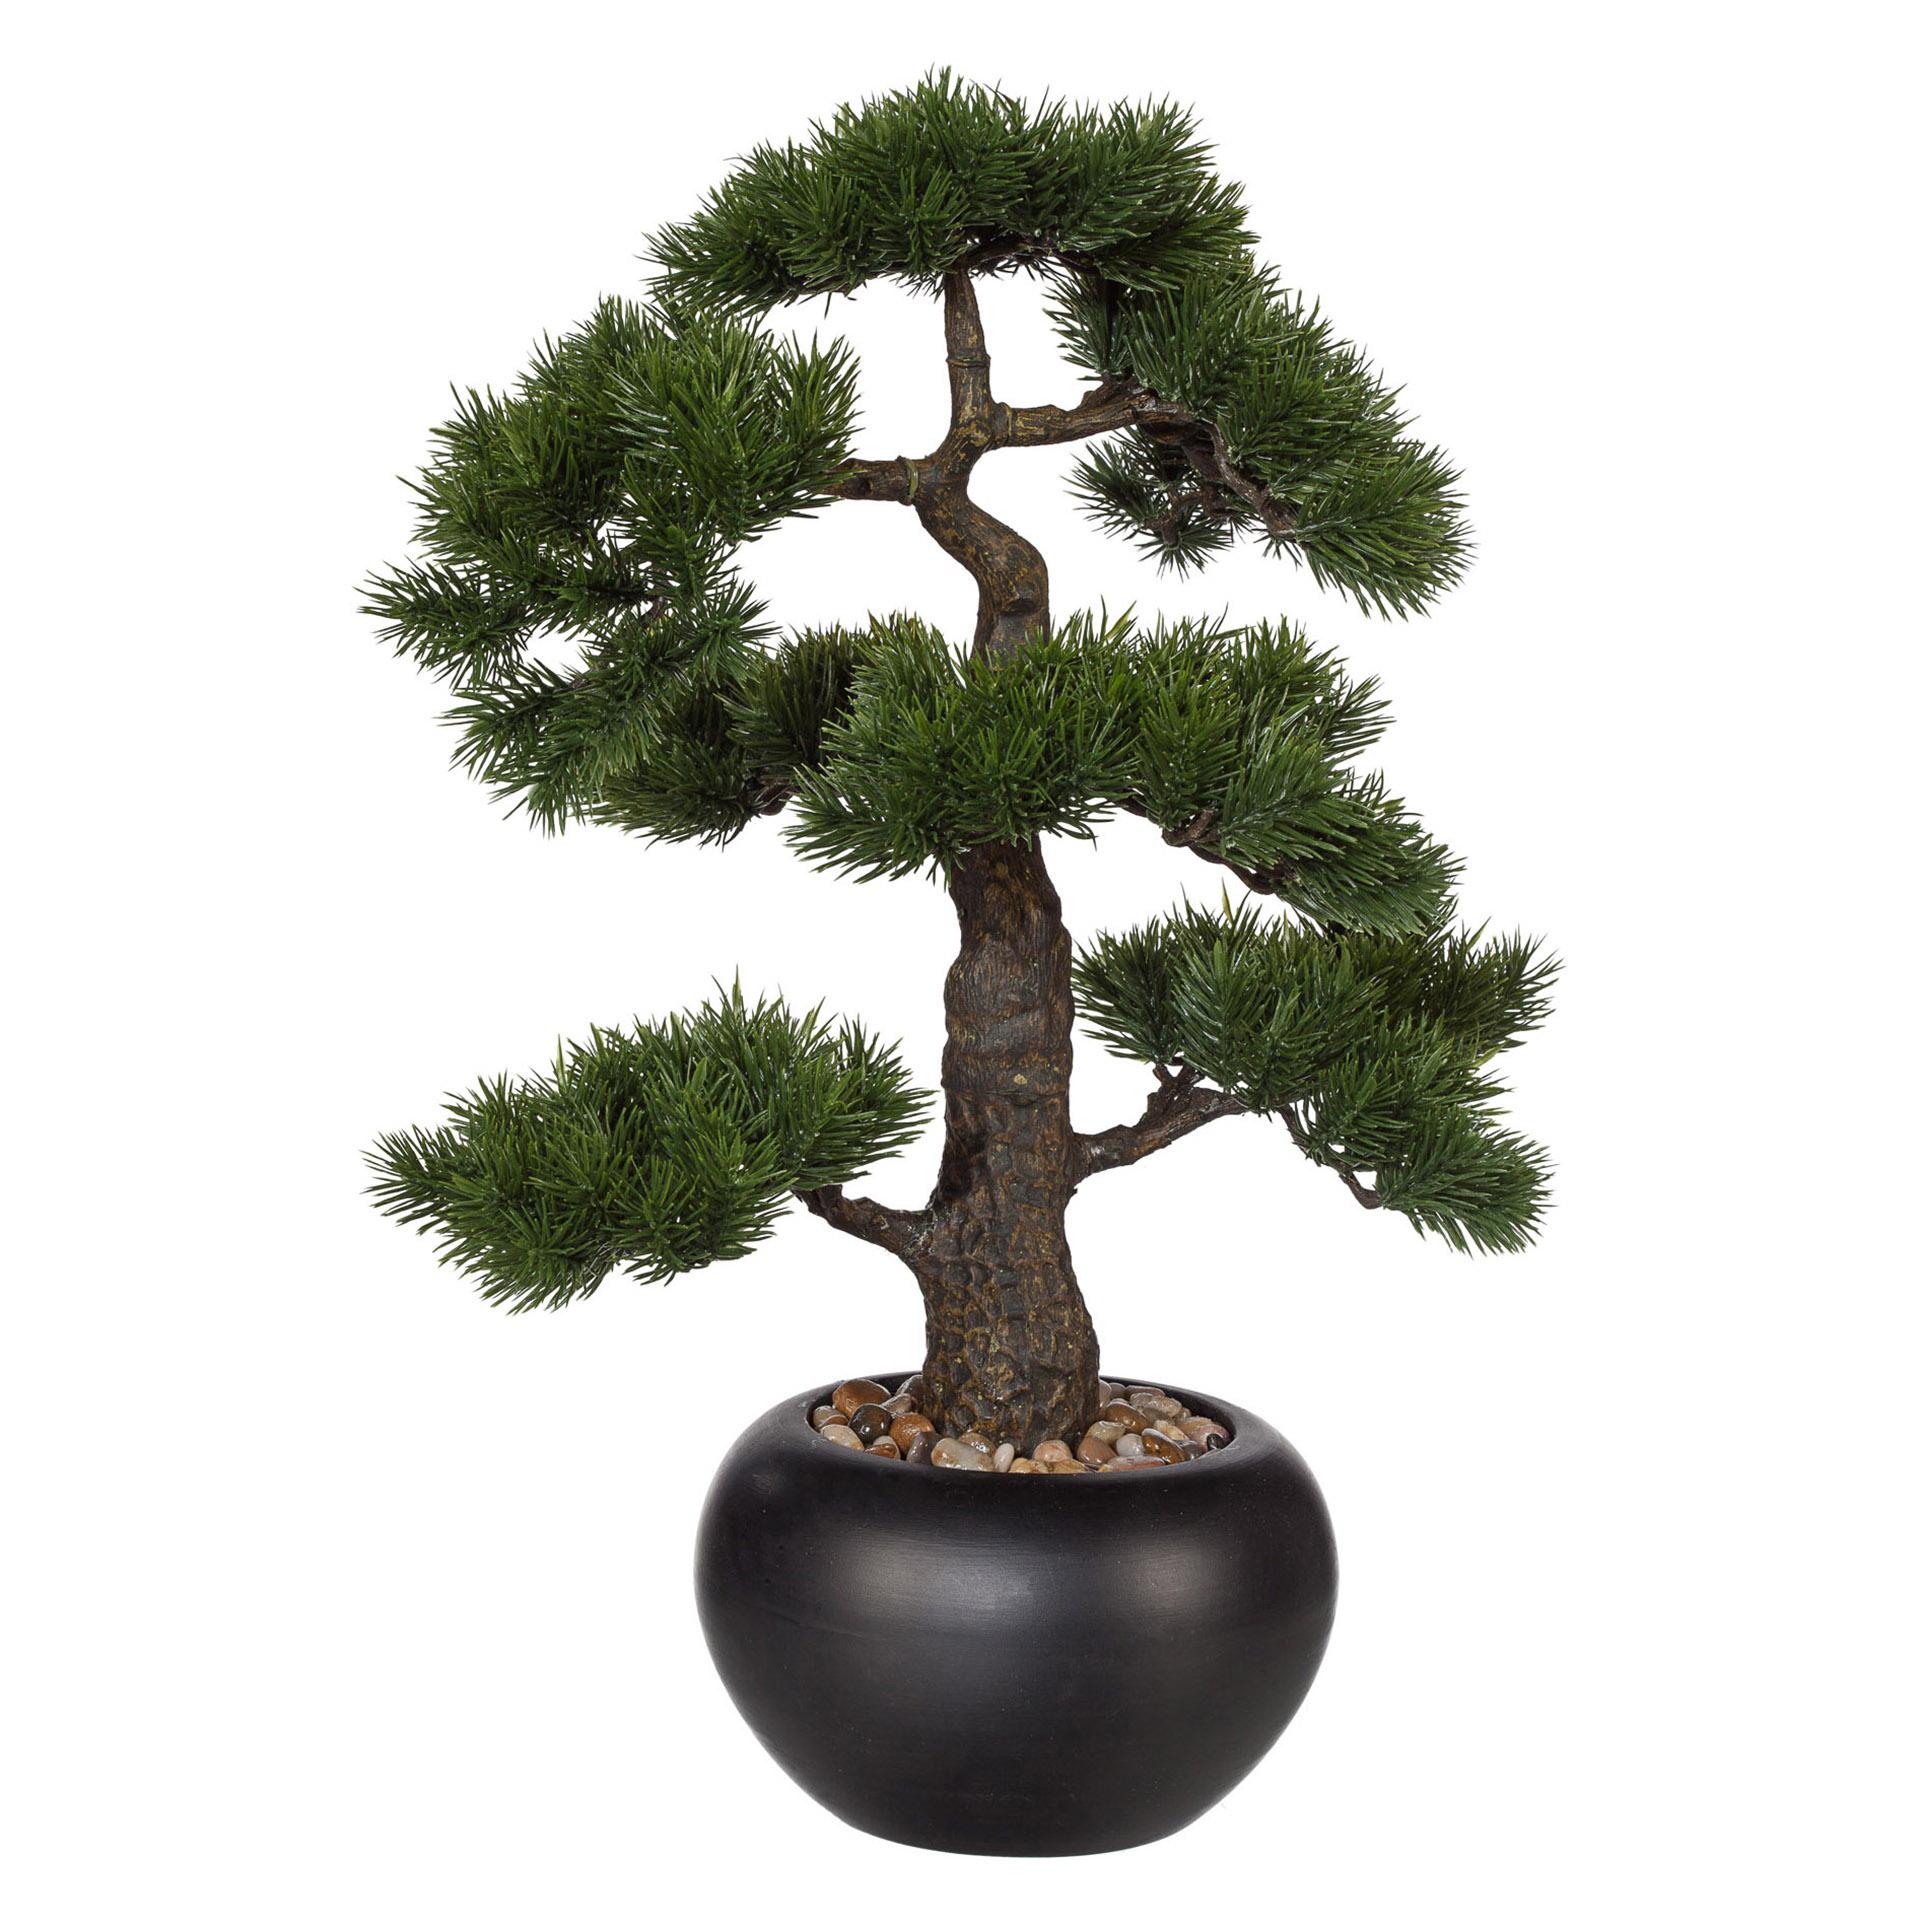 Kunstpflanze Bonsai Kiefer 48cm